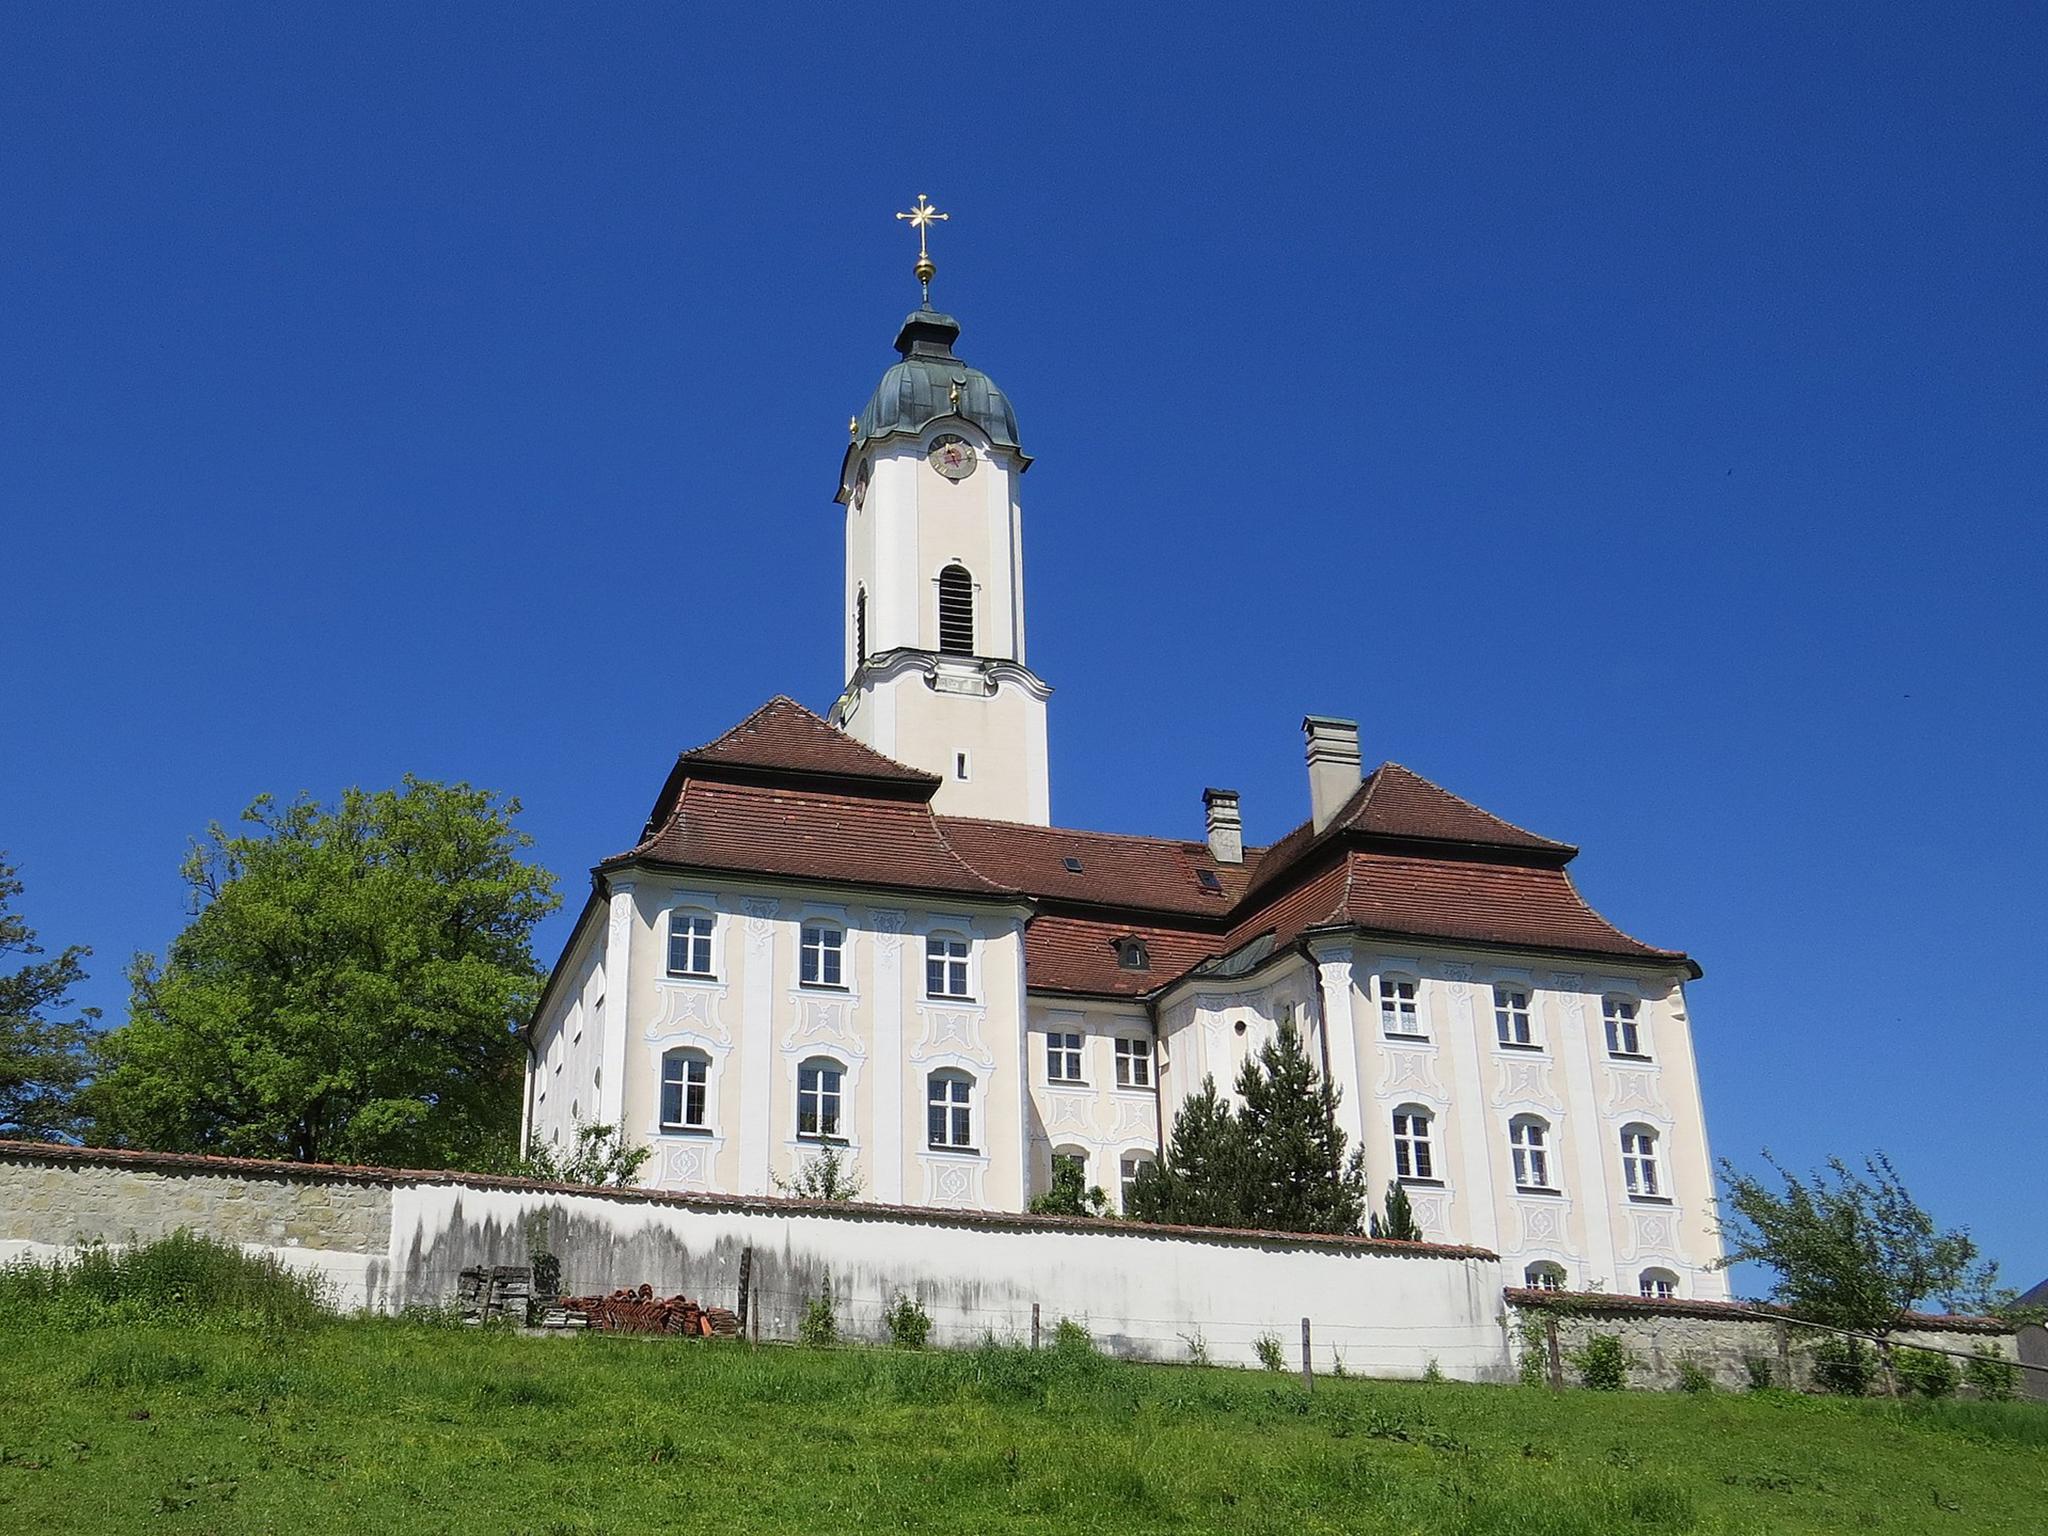 Wieskirche_5_2